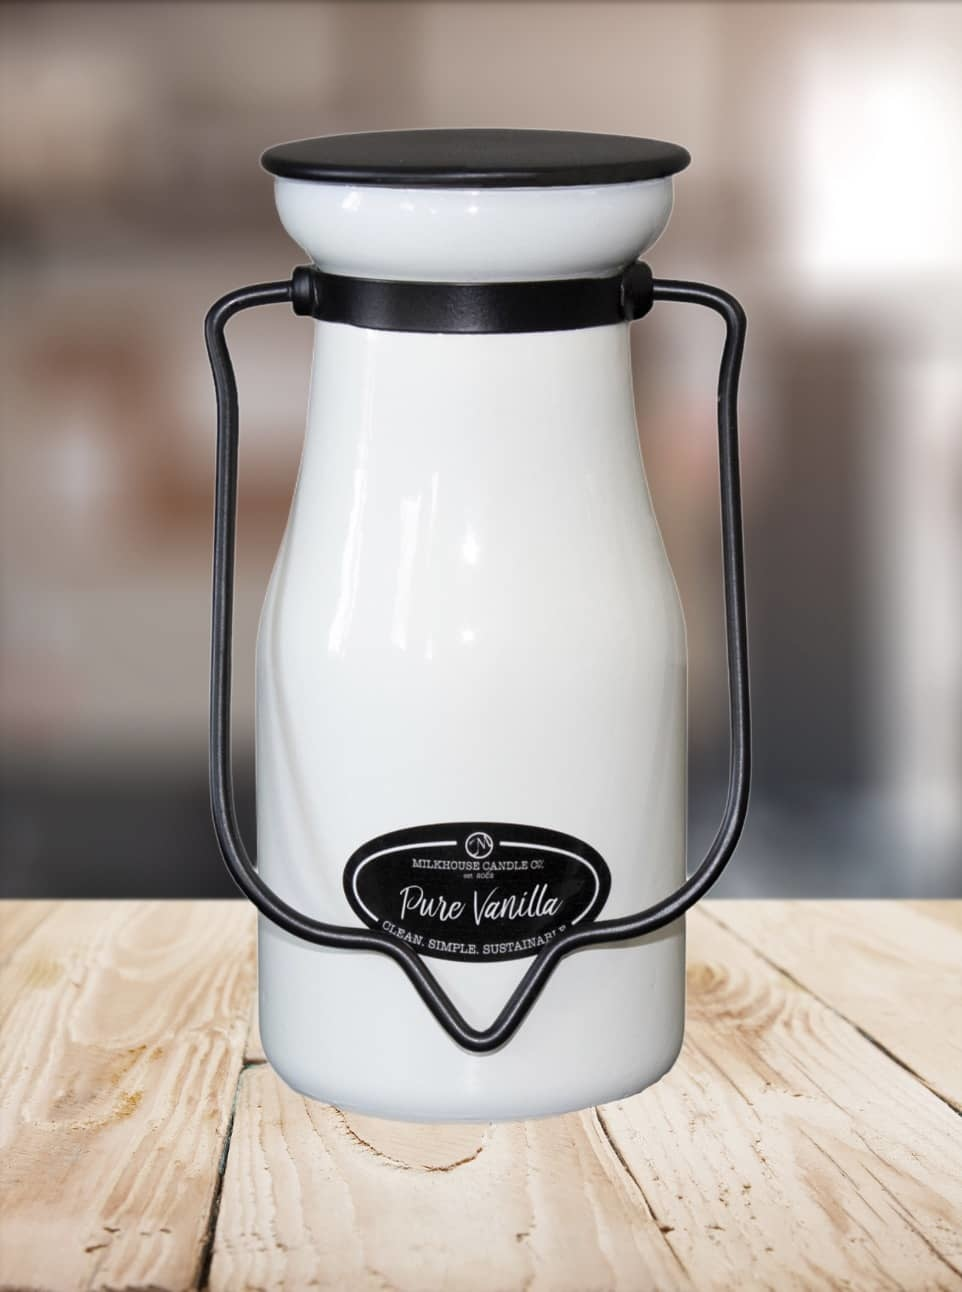 Milkhouse Candles Milkhouse Candle Pure Vanilla 8oz Milk Bottle